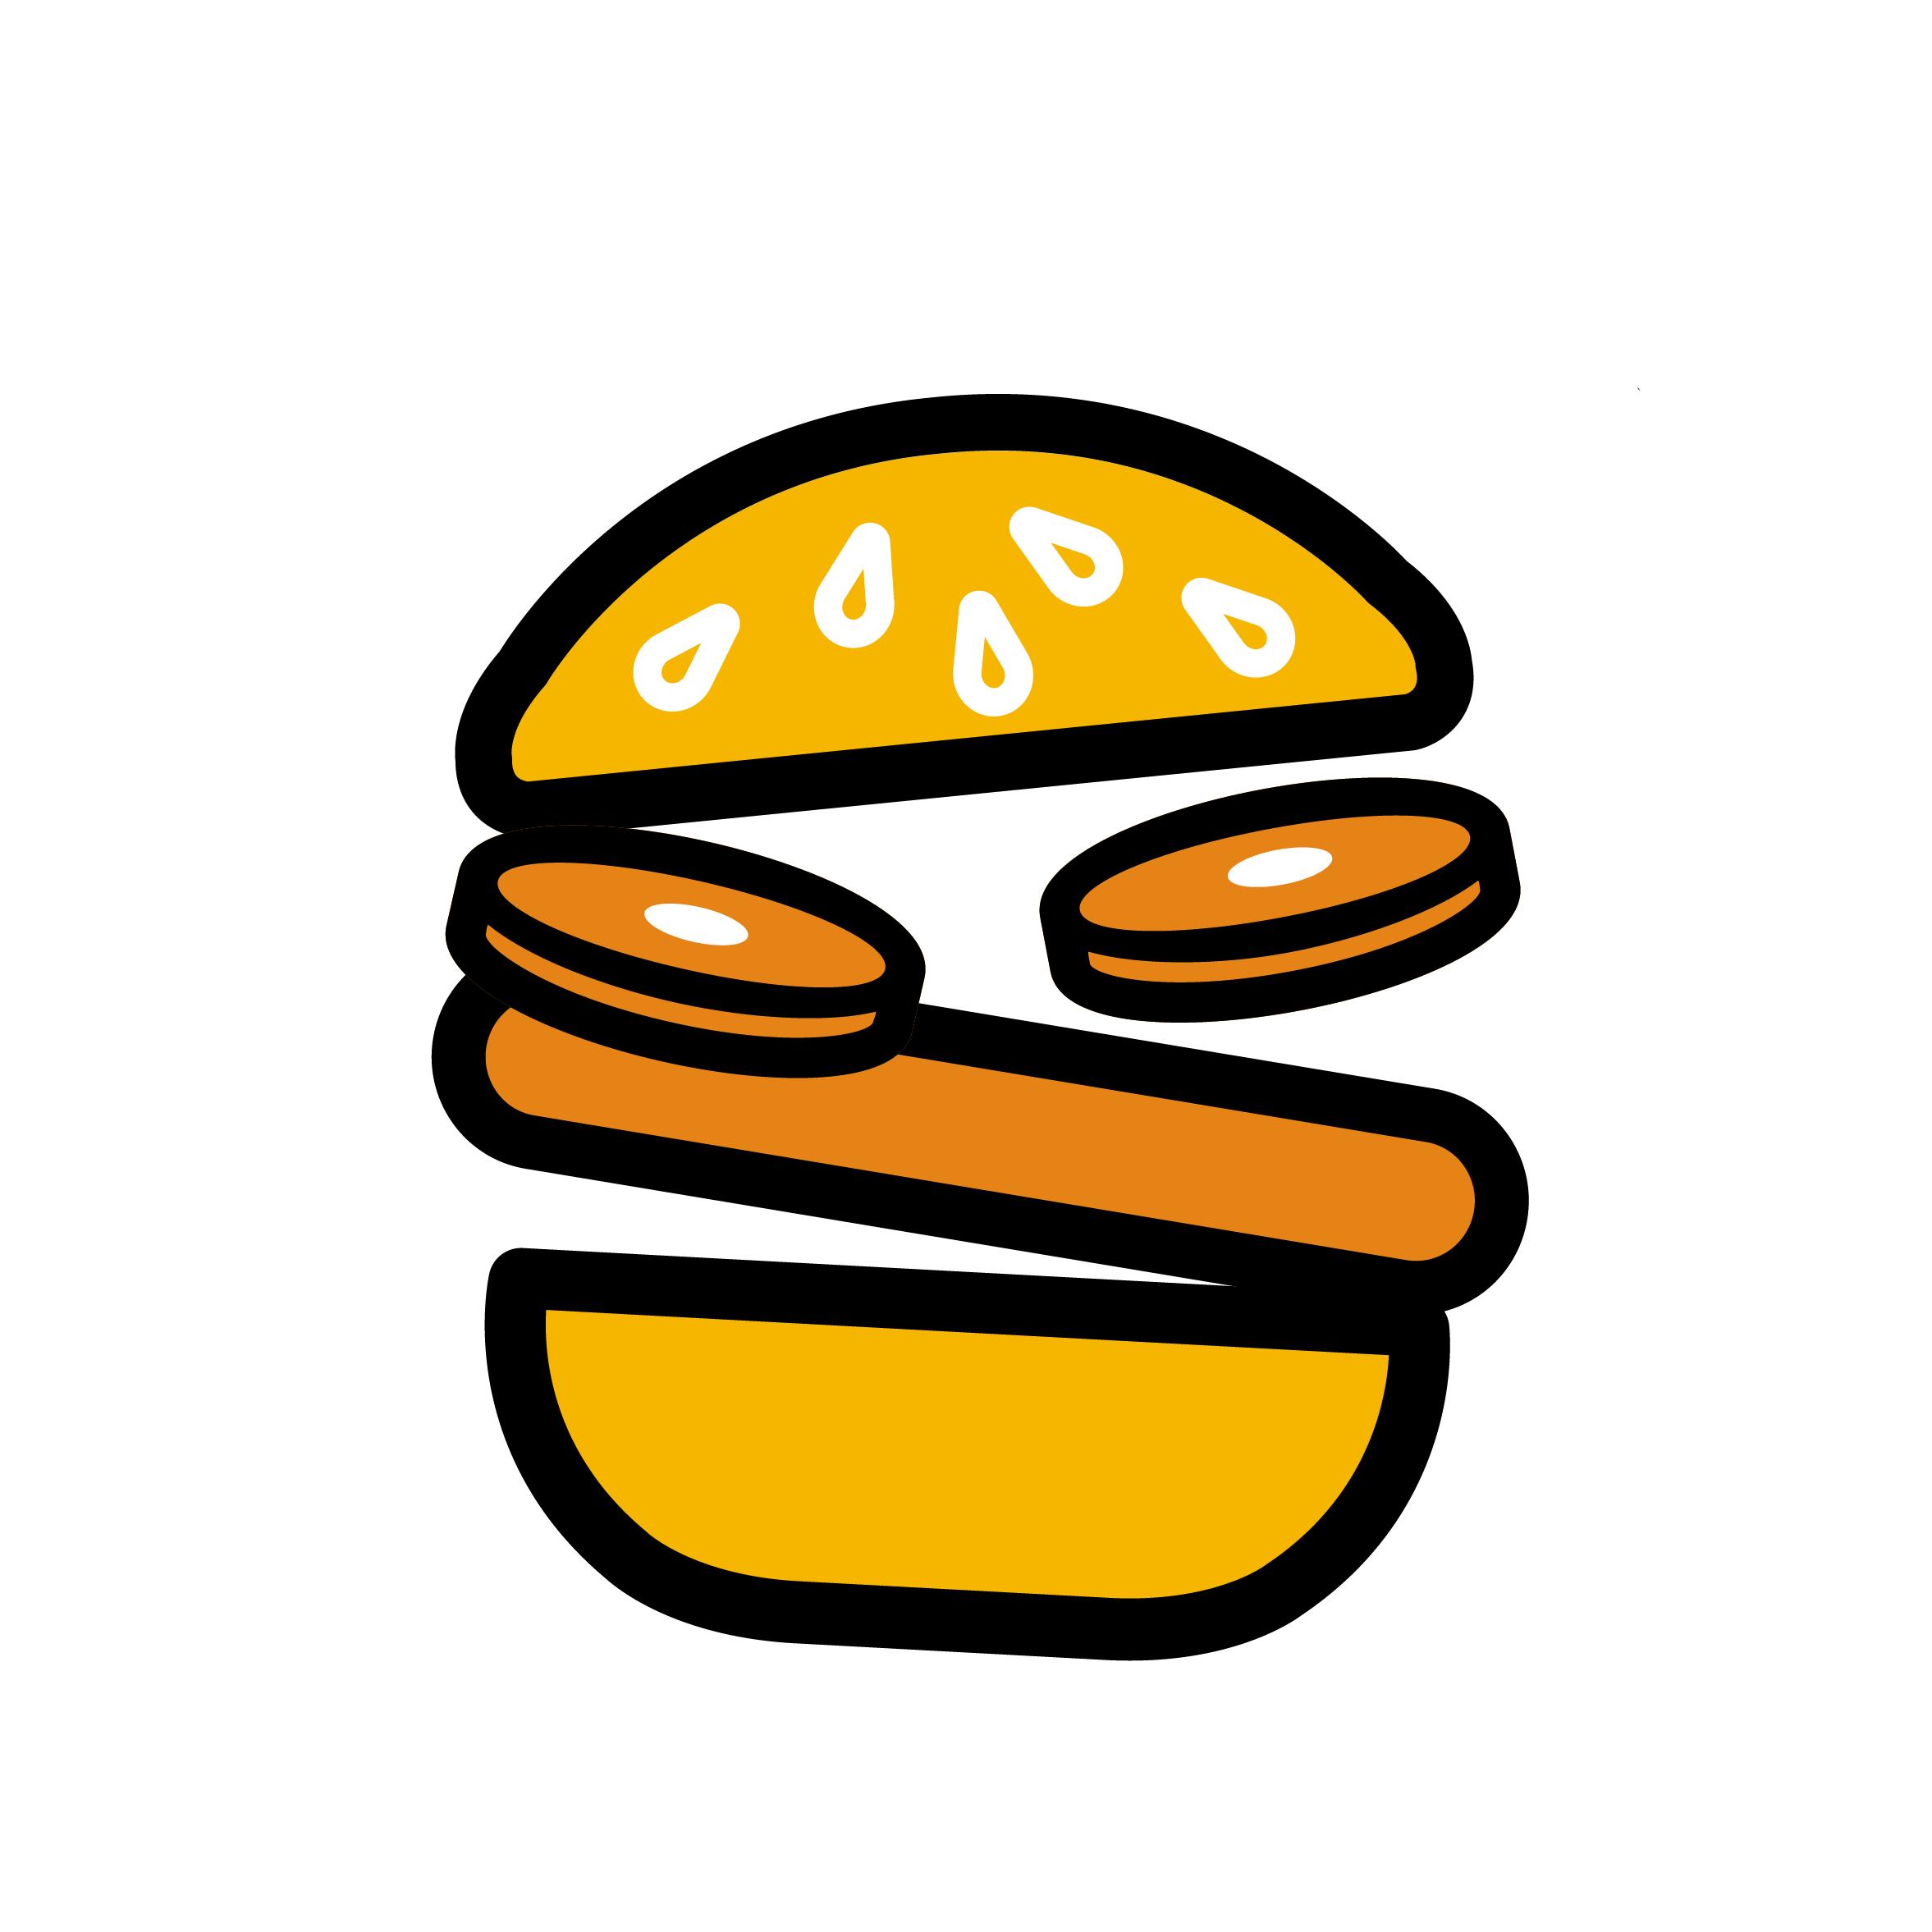 Restaurant Food Truck - Burger